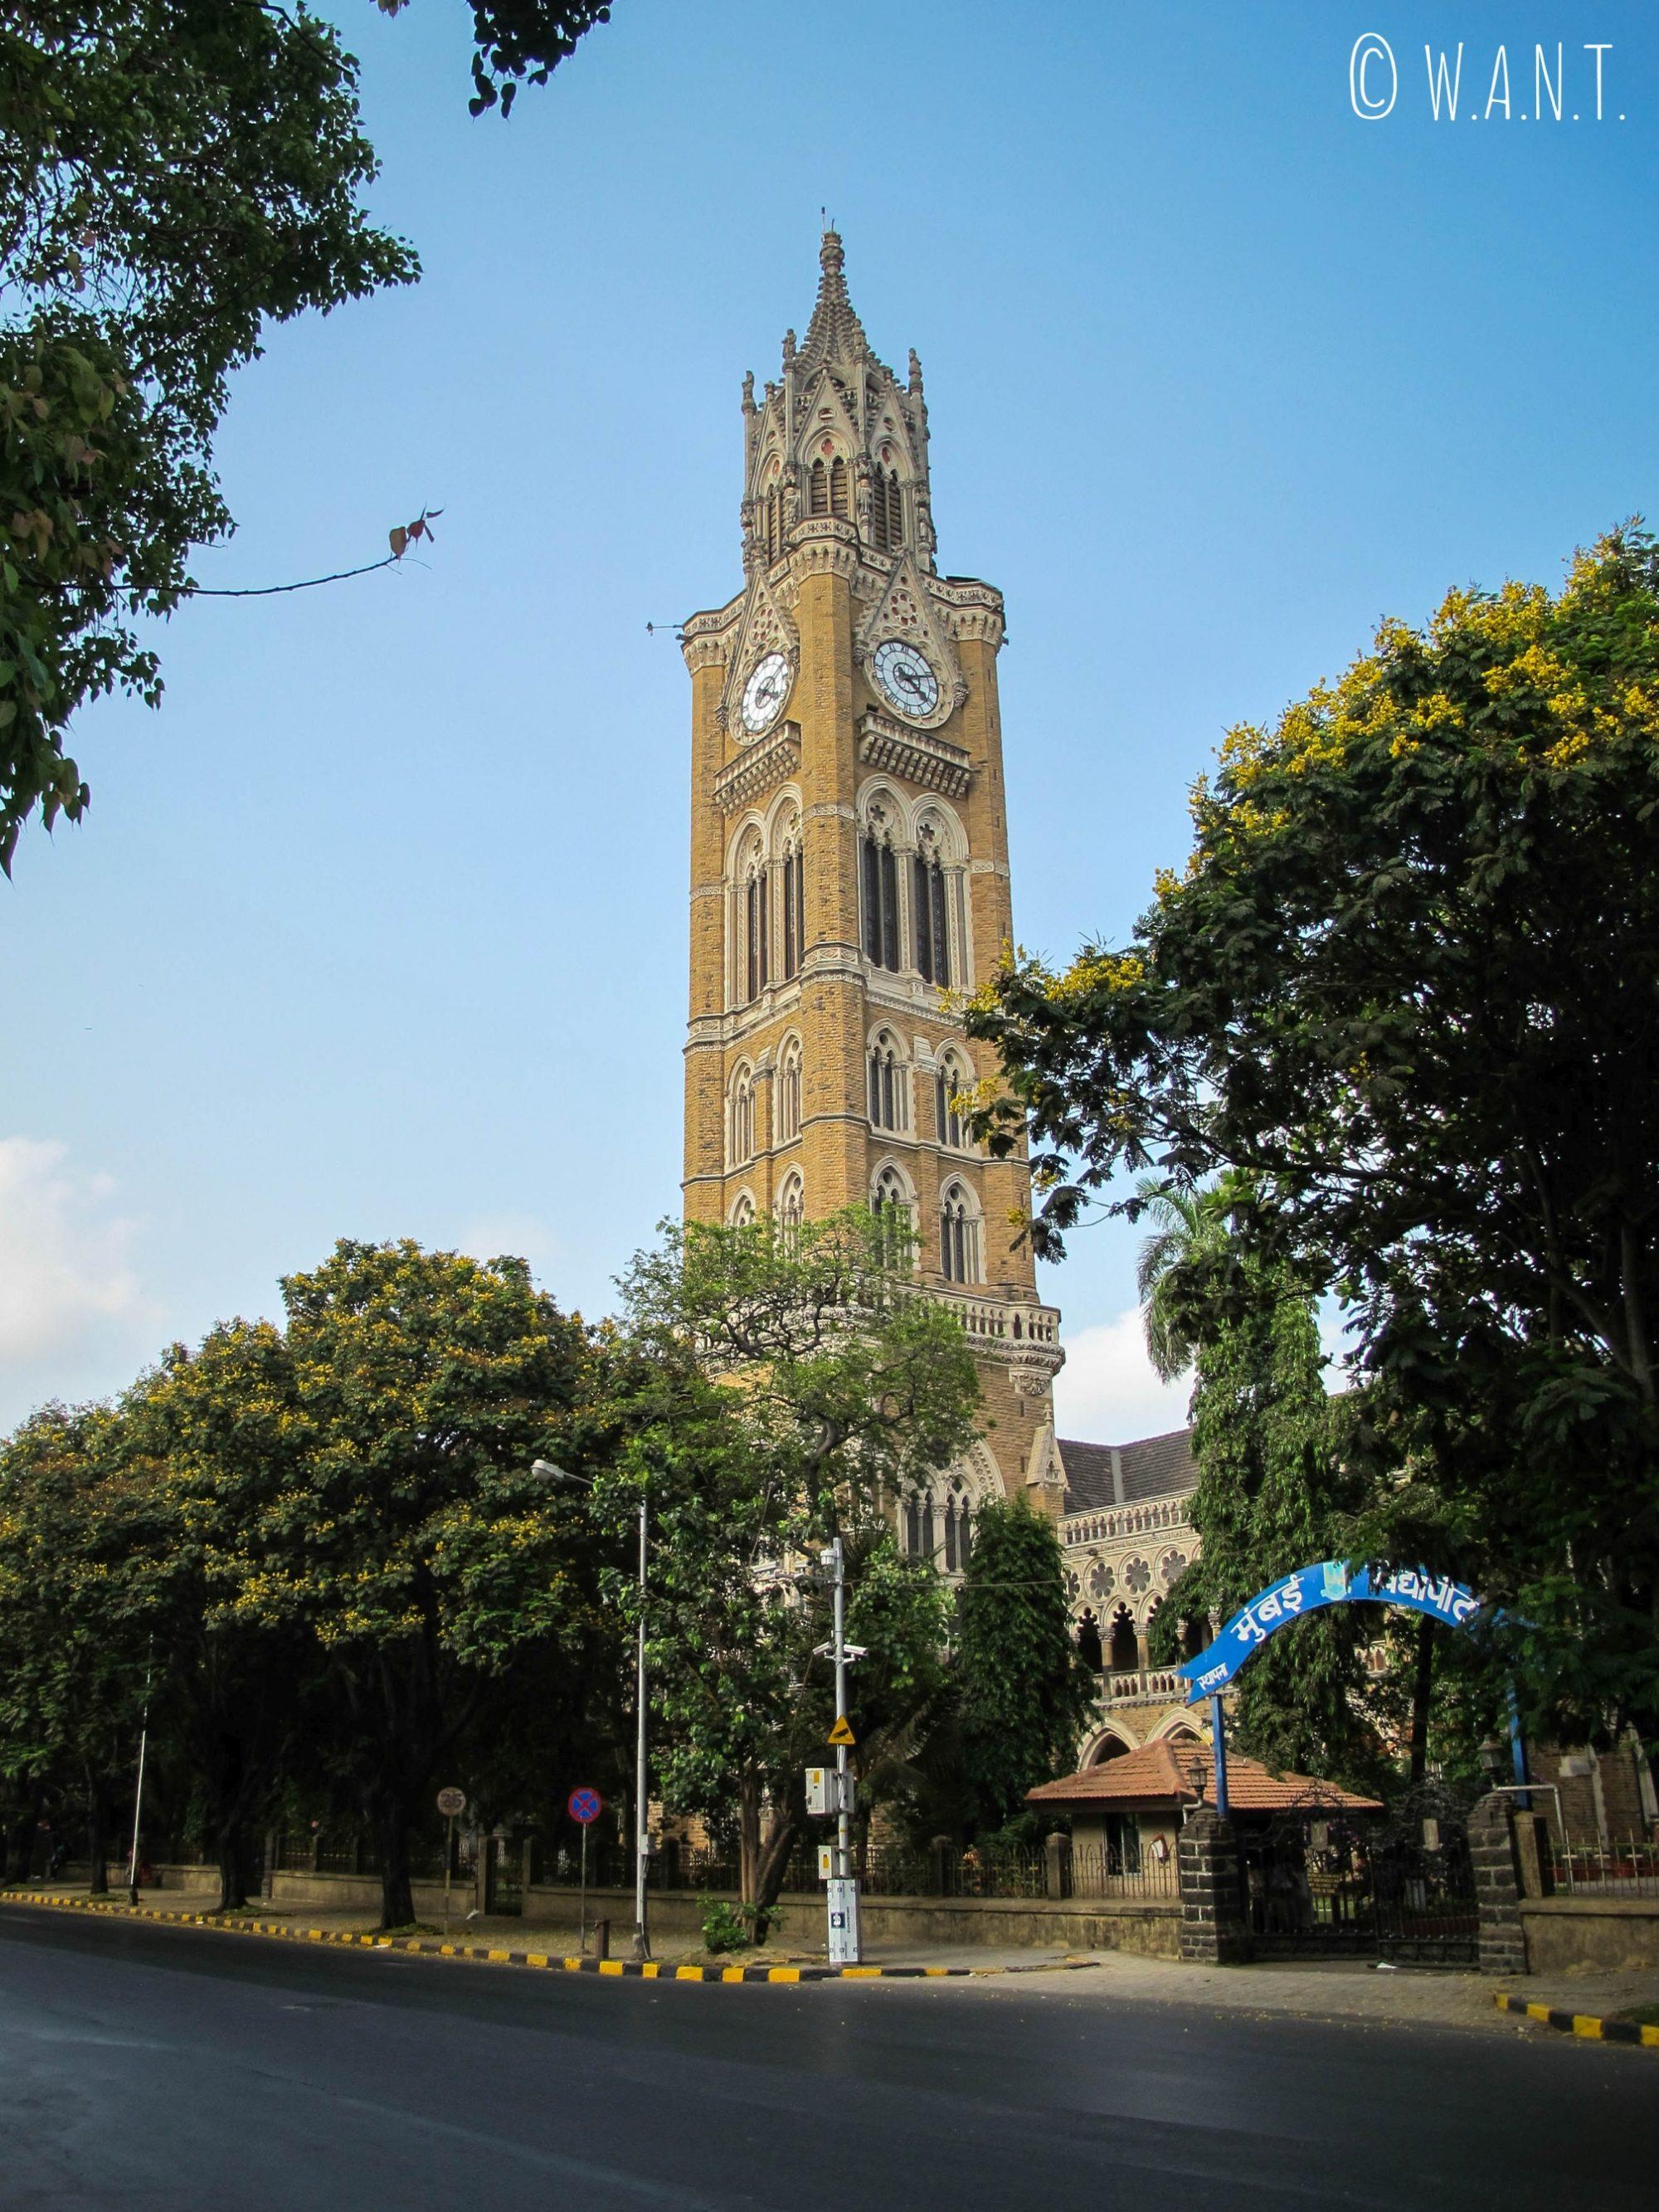 Tour de l'Horloge de Mumbai